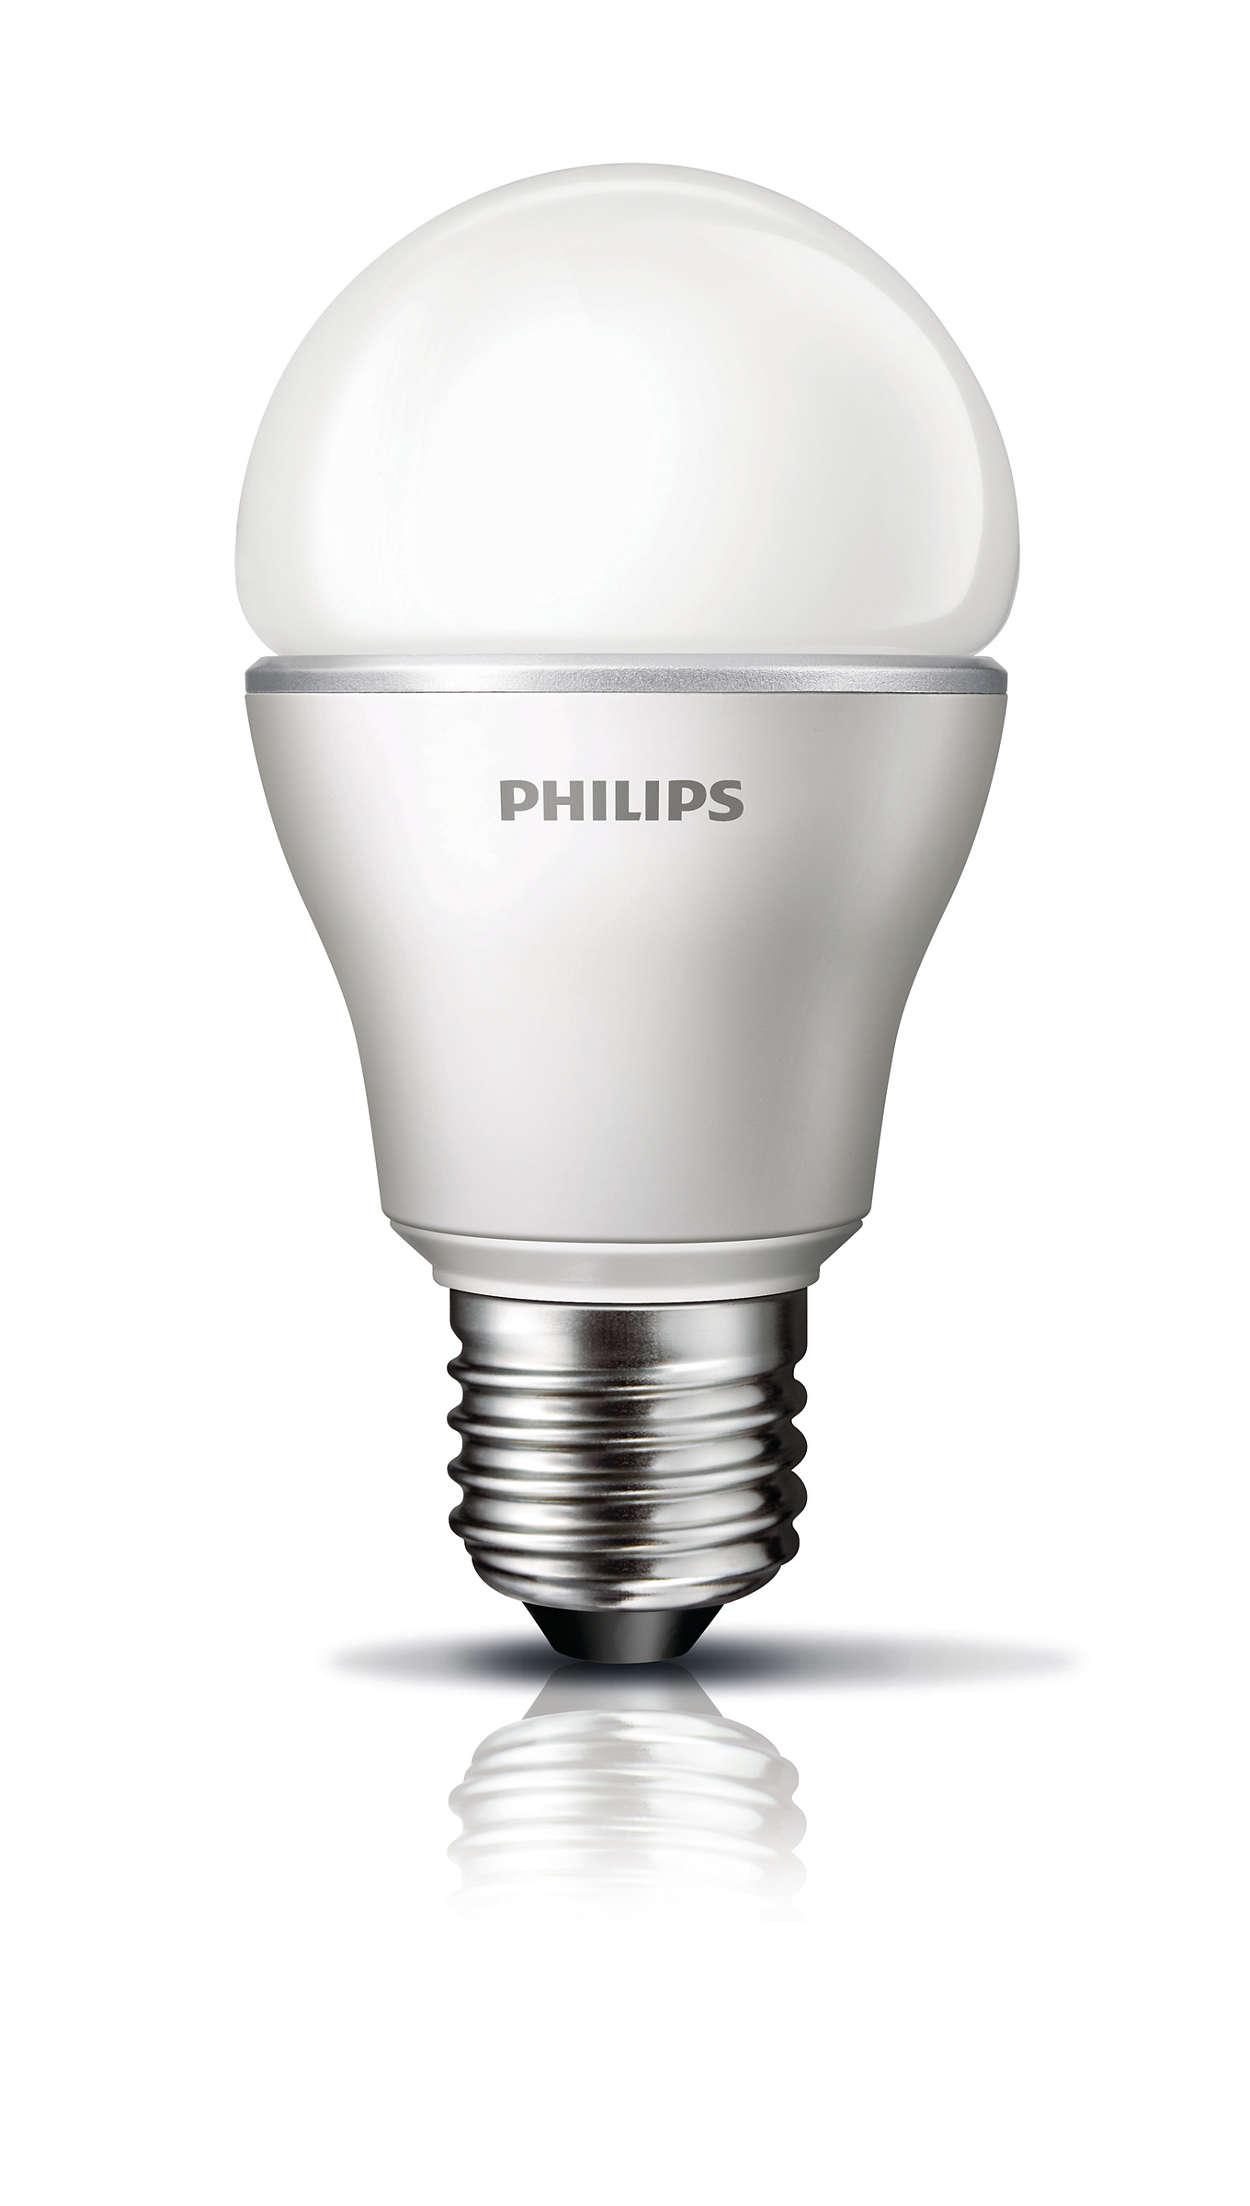 Energibesparing utan kompromiss